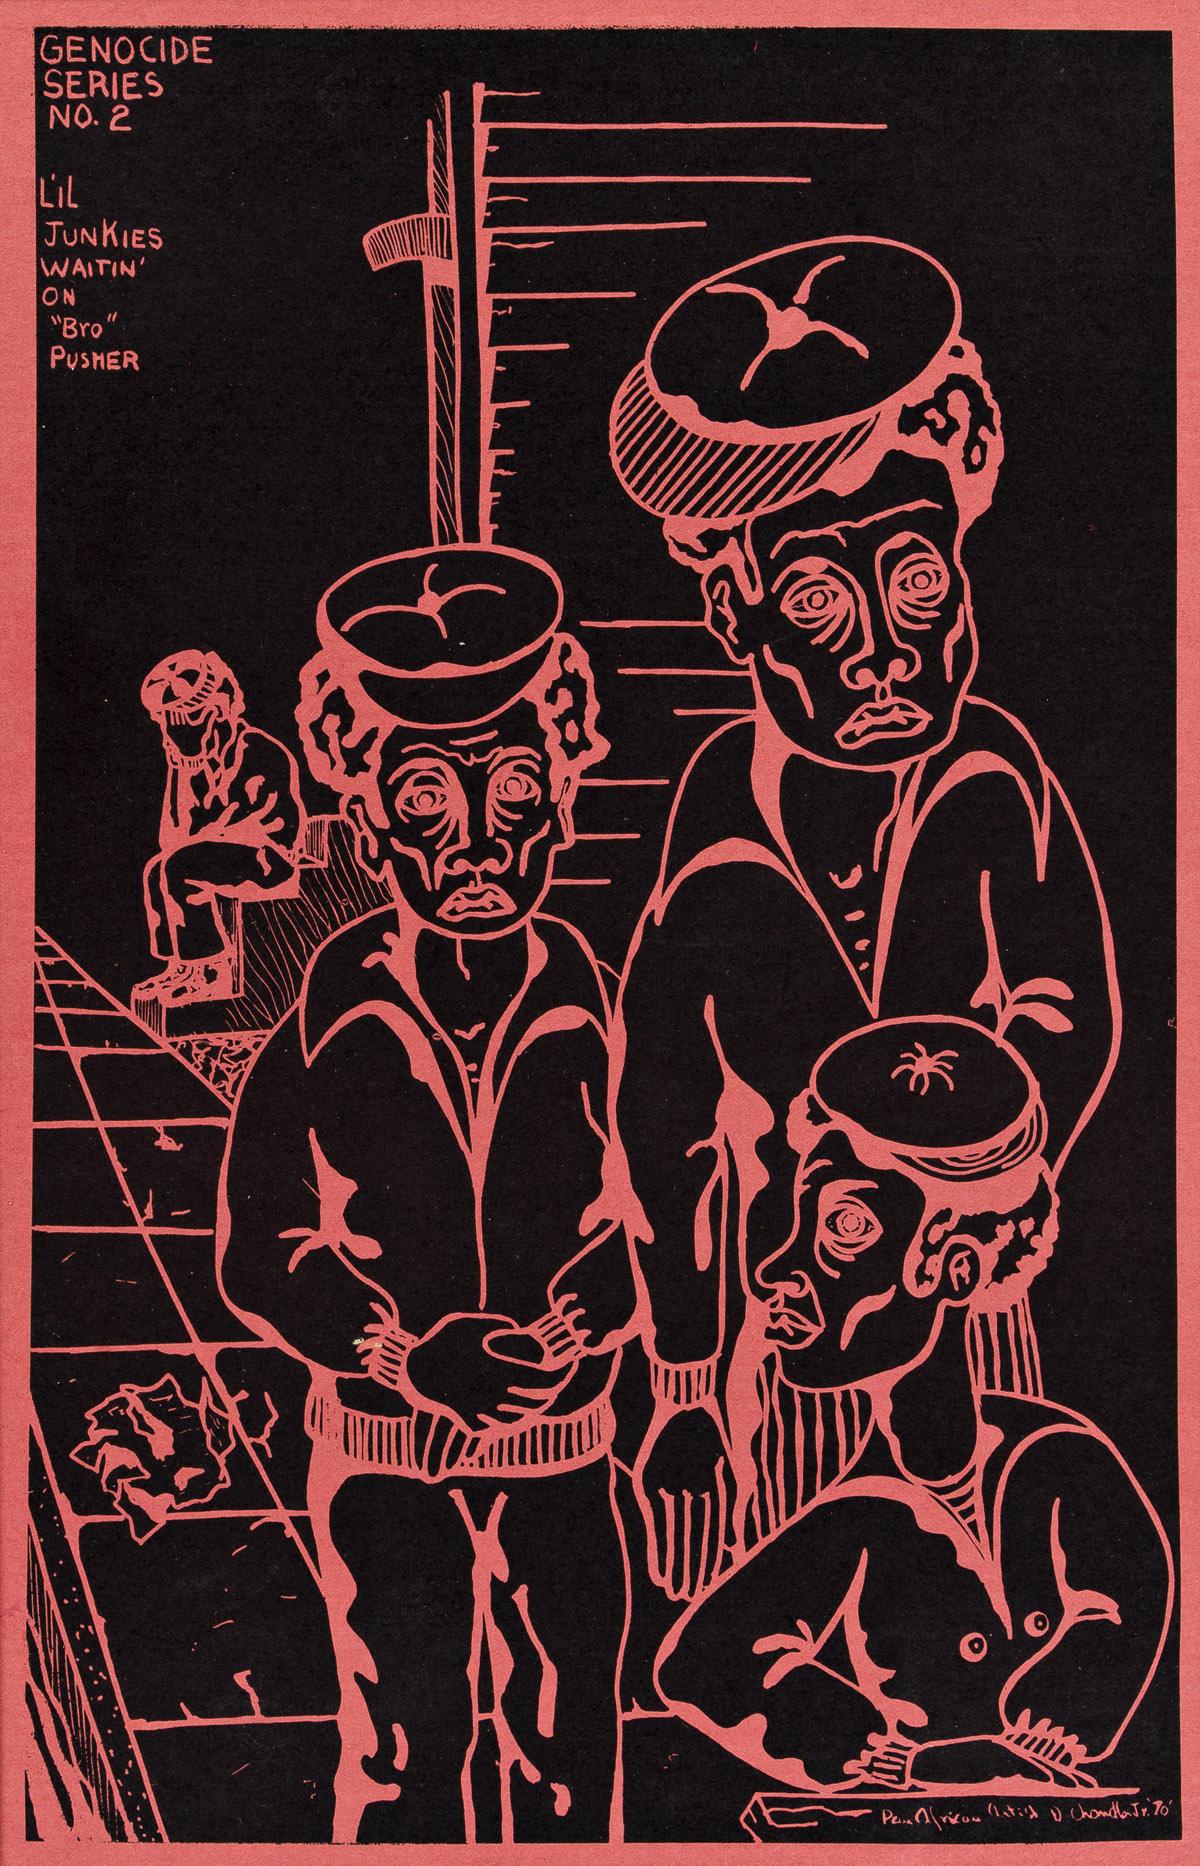 DANA C. CHANDLER, JR. (1941 - ) Genocide Series No. 2, Lil Junkies Waiting on Bro Pusher.